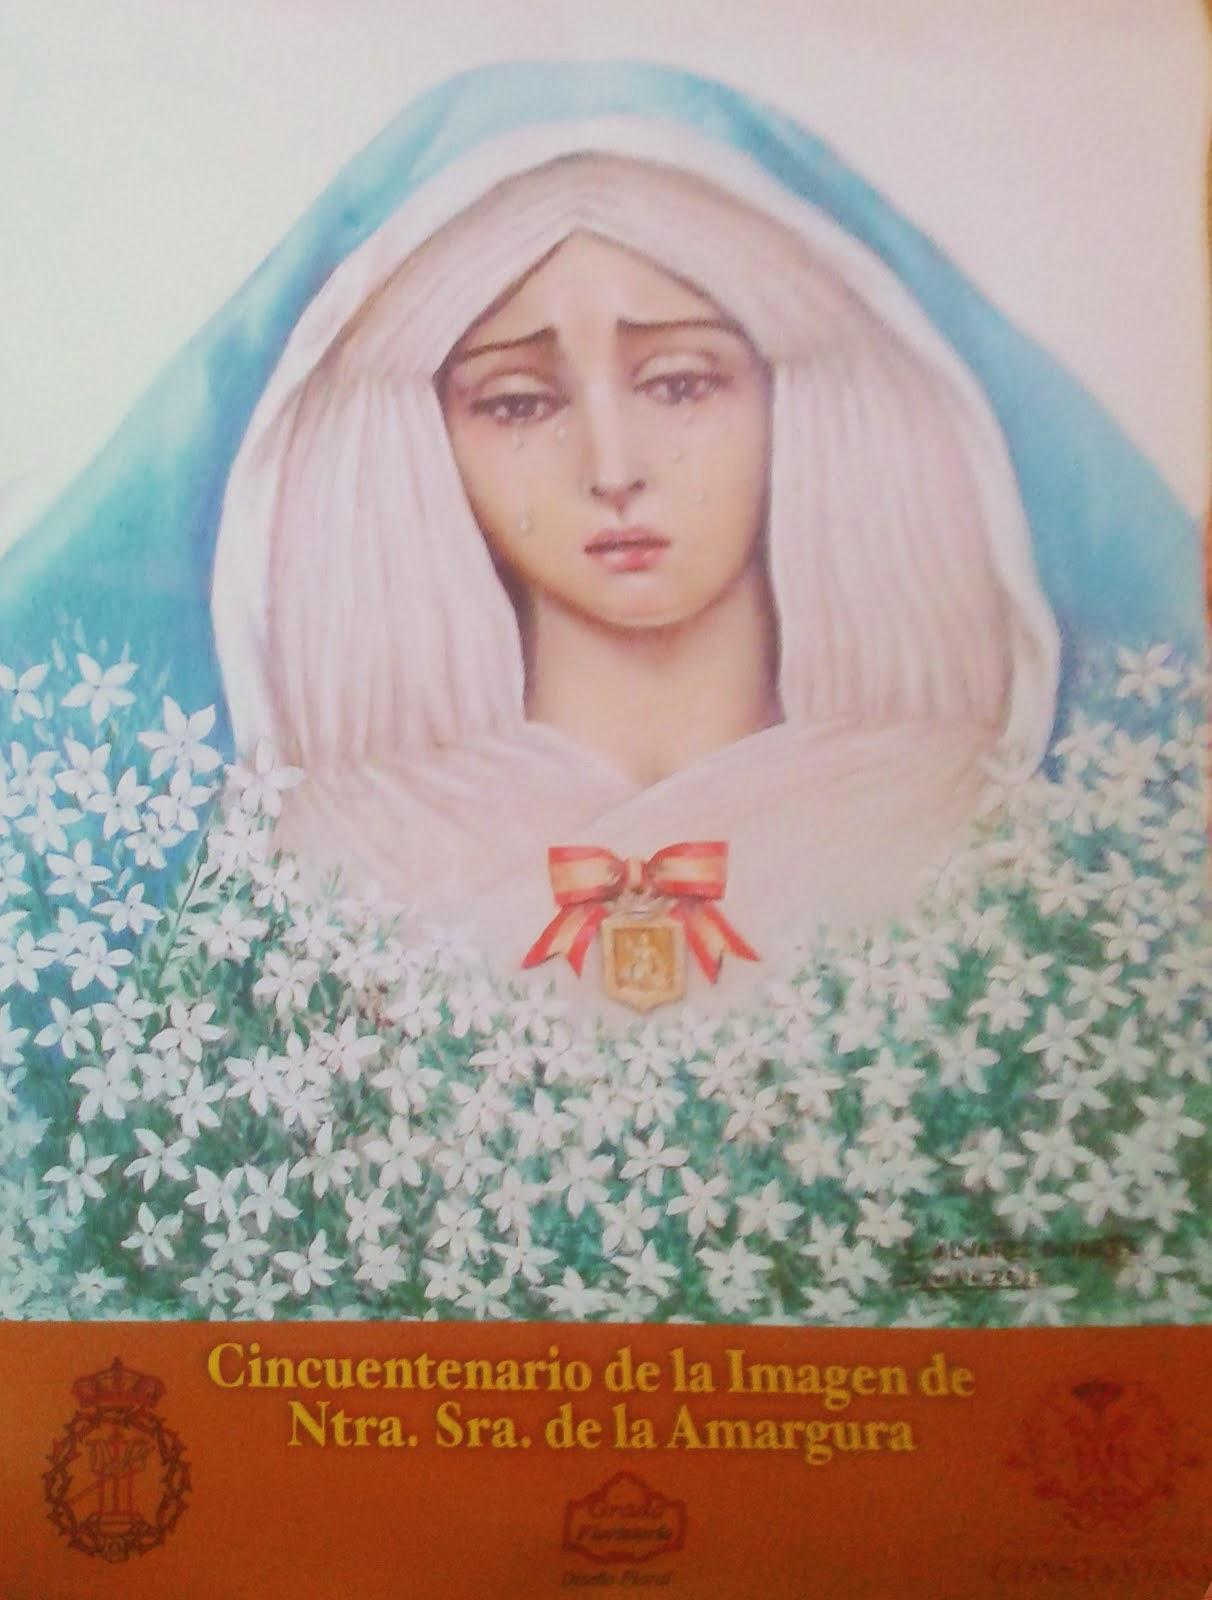 VENTA CARTEL CONMEMORATIVO -Obra de D. Luis Ávarez Duarte-